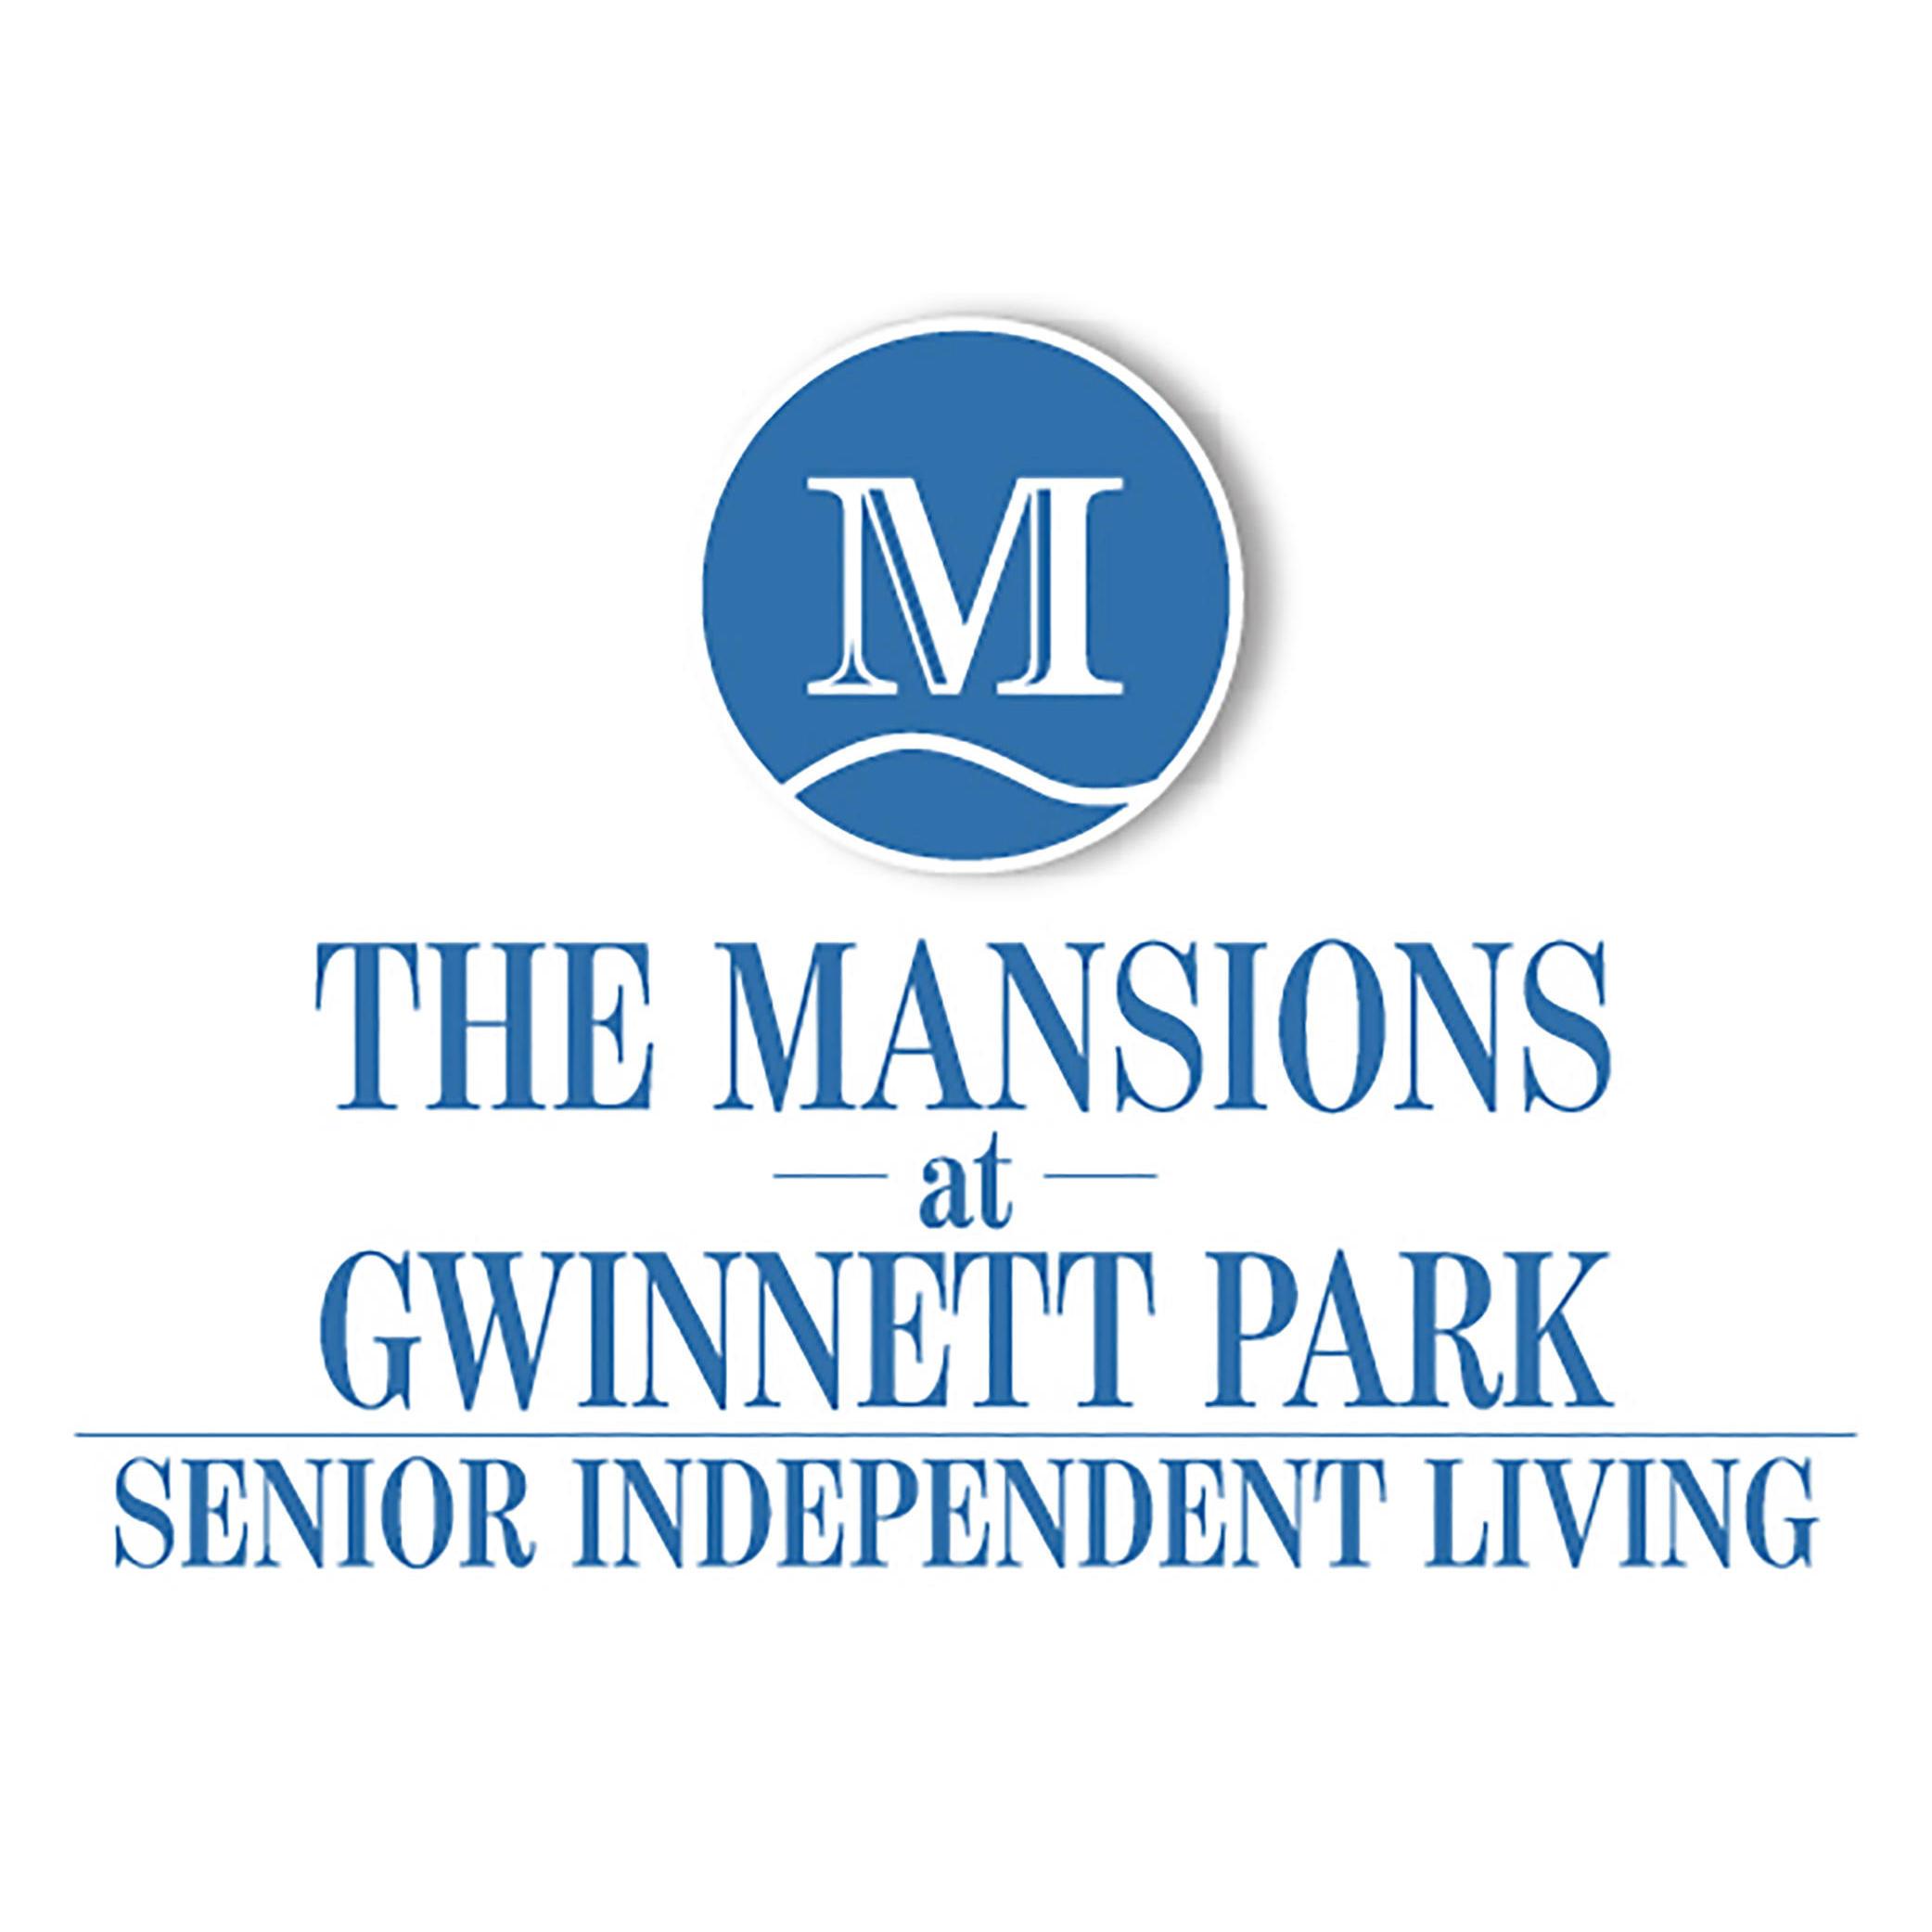 The Mansion at Gwinnett Park - Senior Independent Living